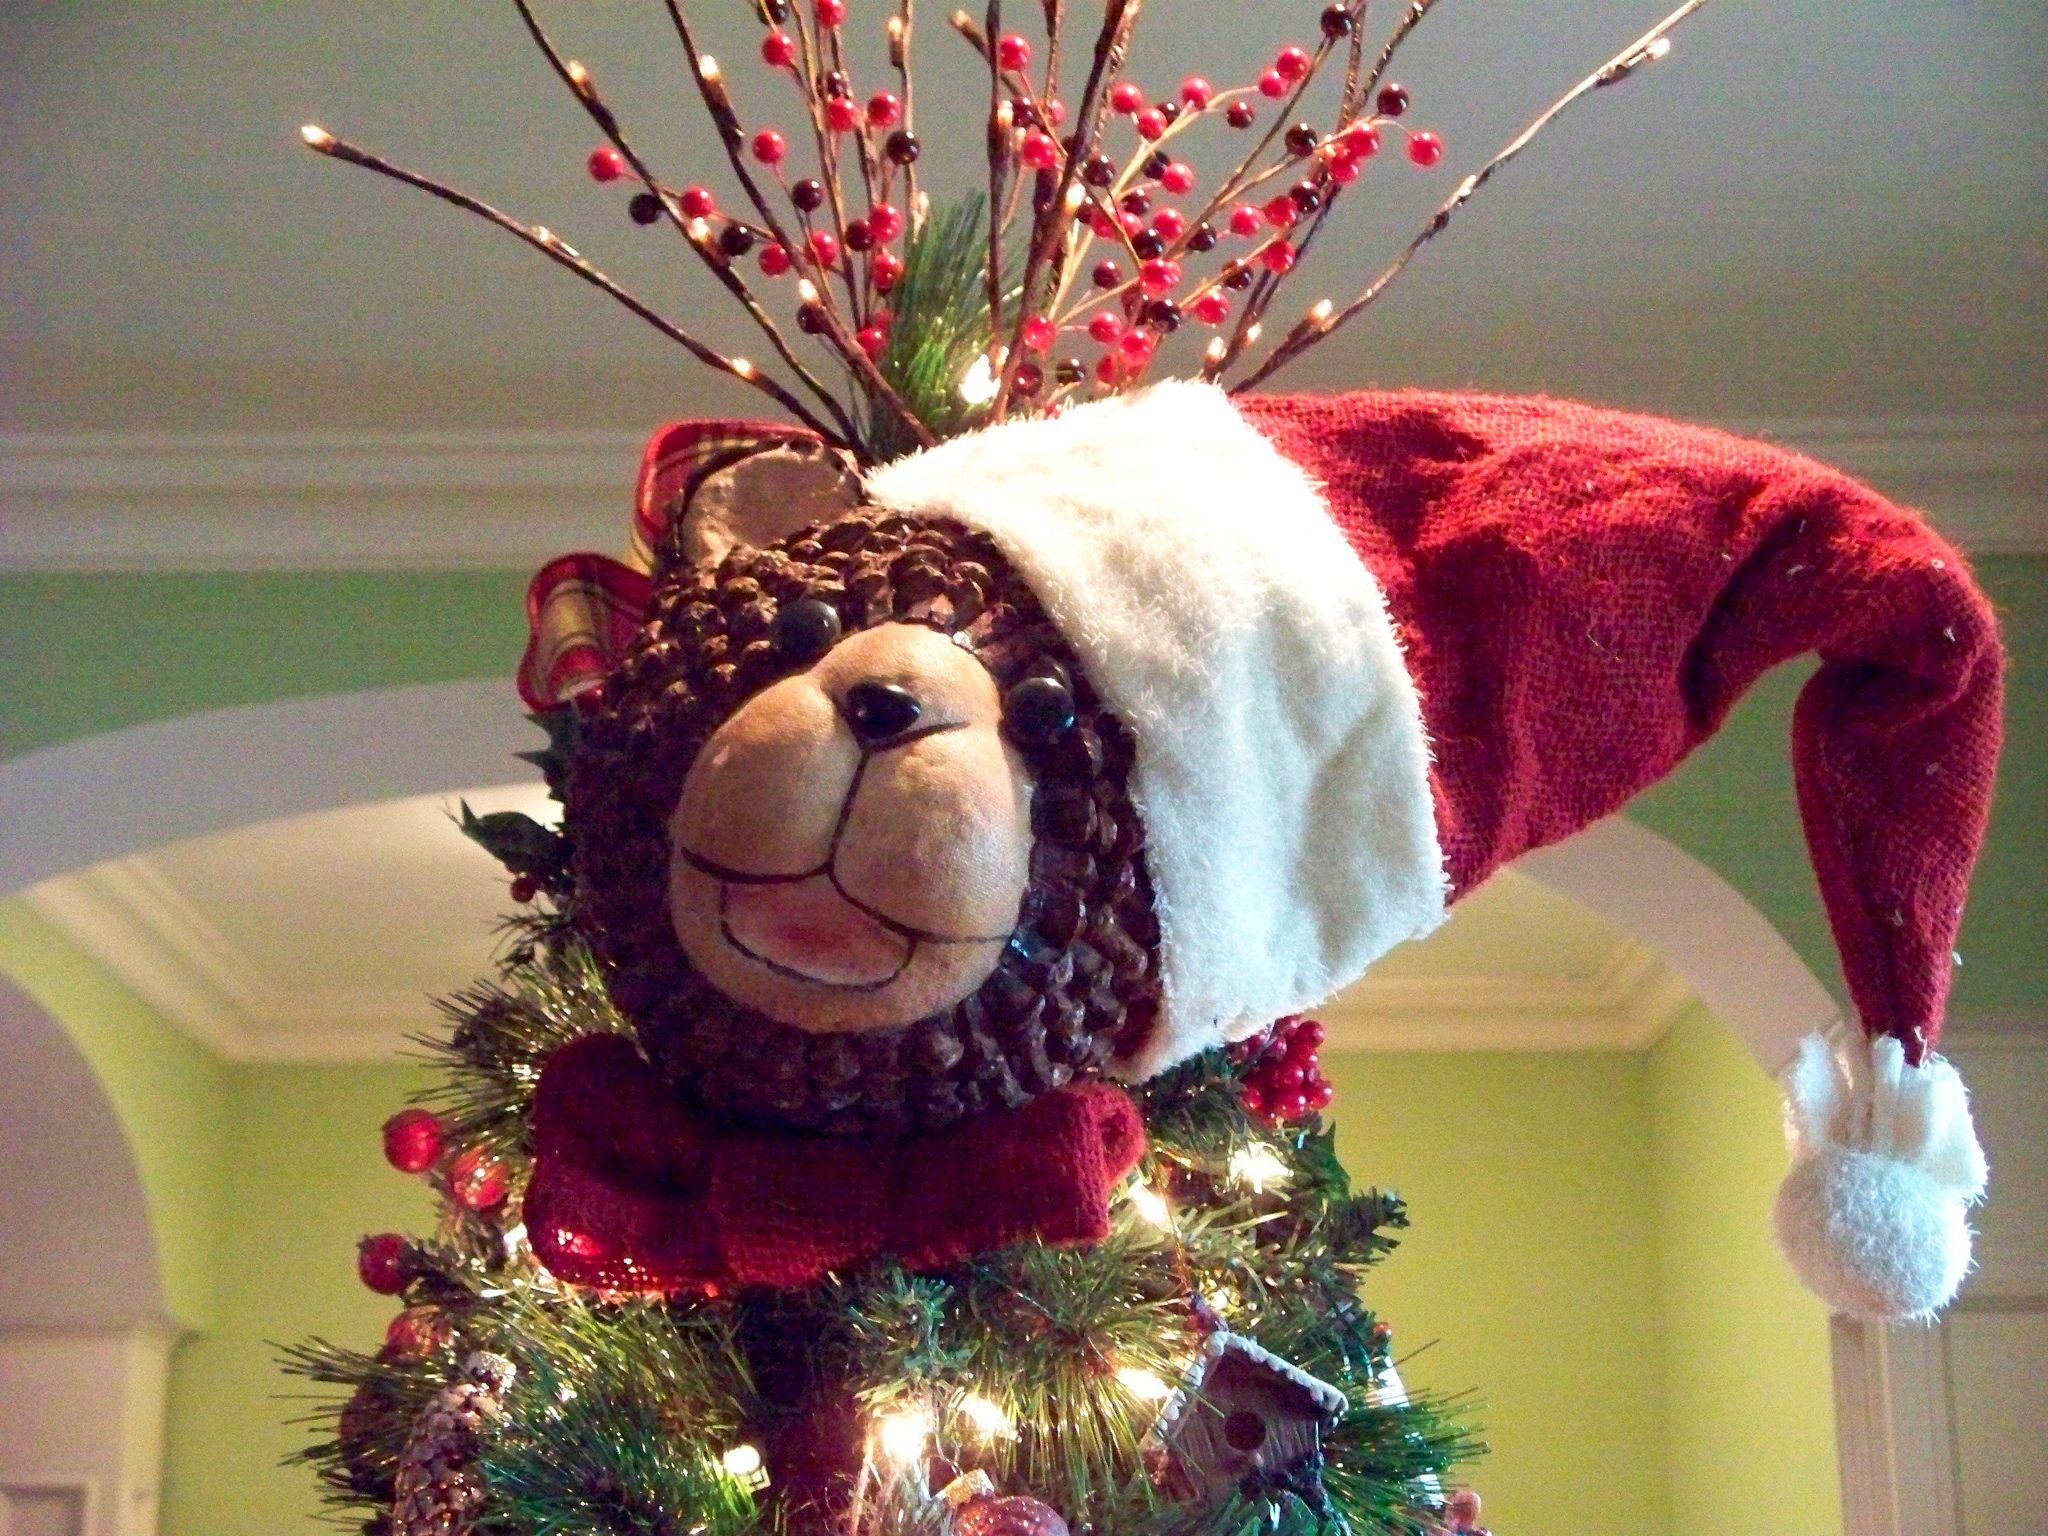 Pinecone teddy bear Christmas tree topper